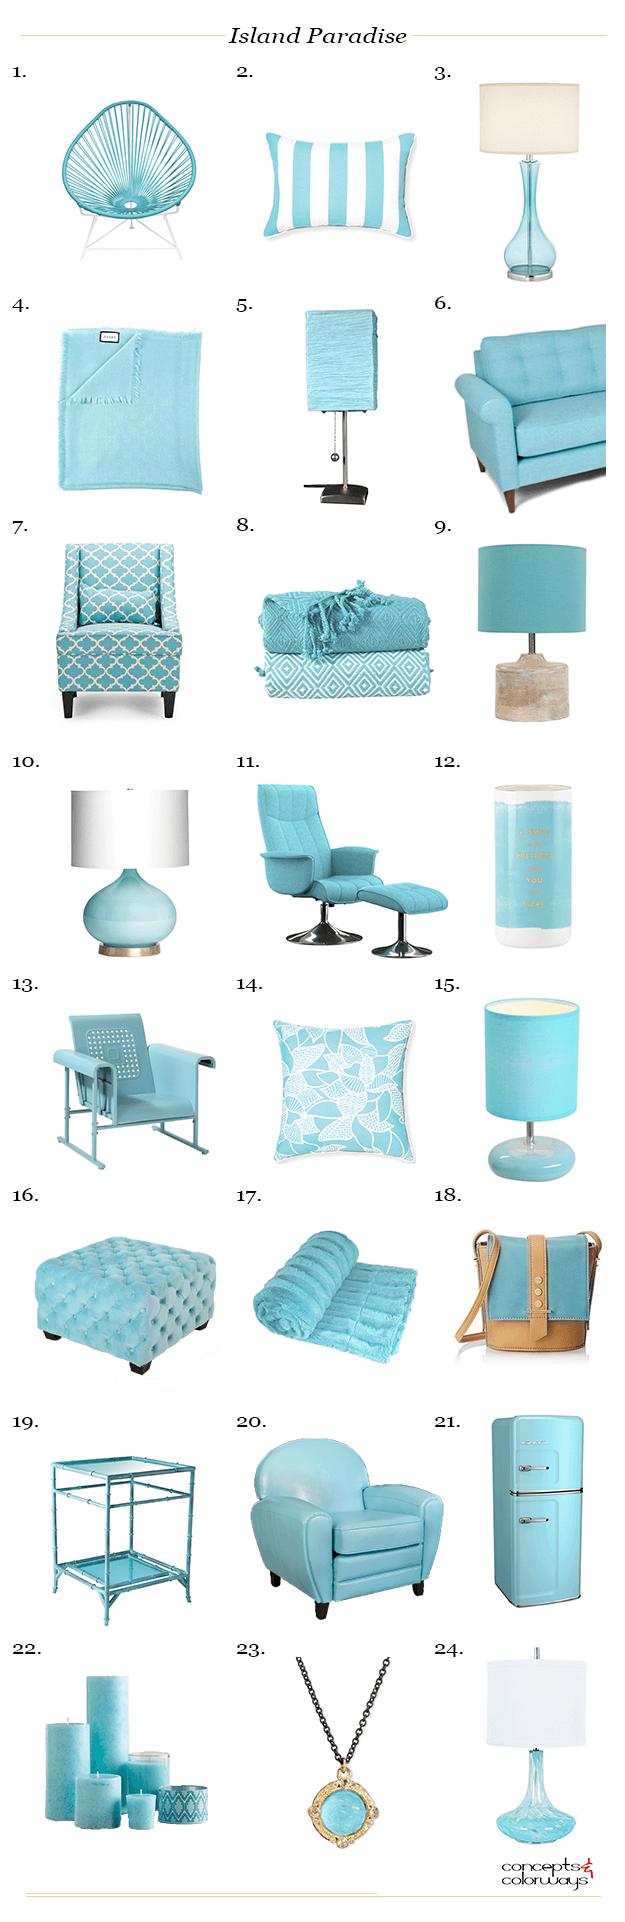 pantone island paradise, interior design product roundup, 2017 color trends, color for interiors, caribbean blue, light turquoise, aqua blue, tiffany blue, bright blue